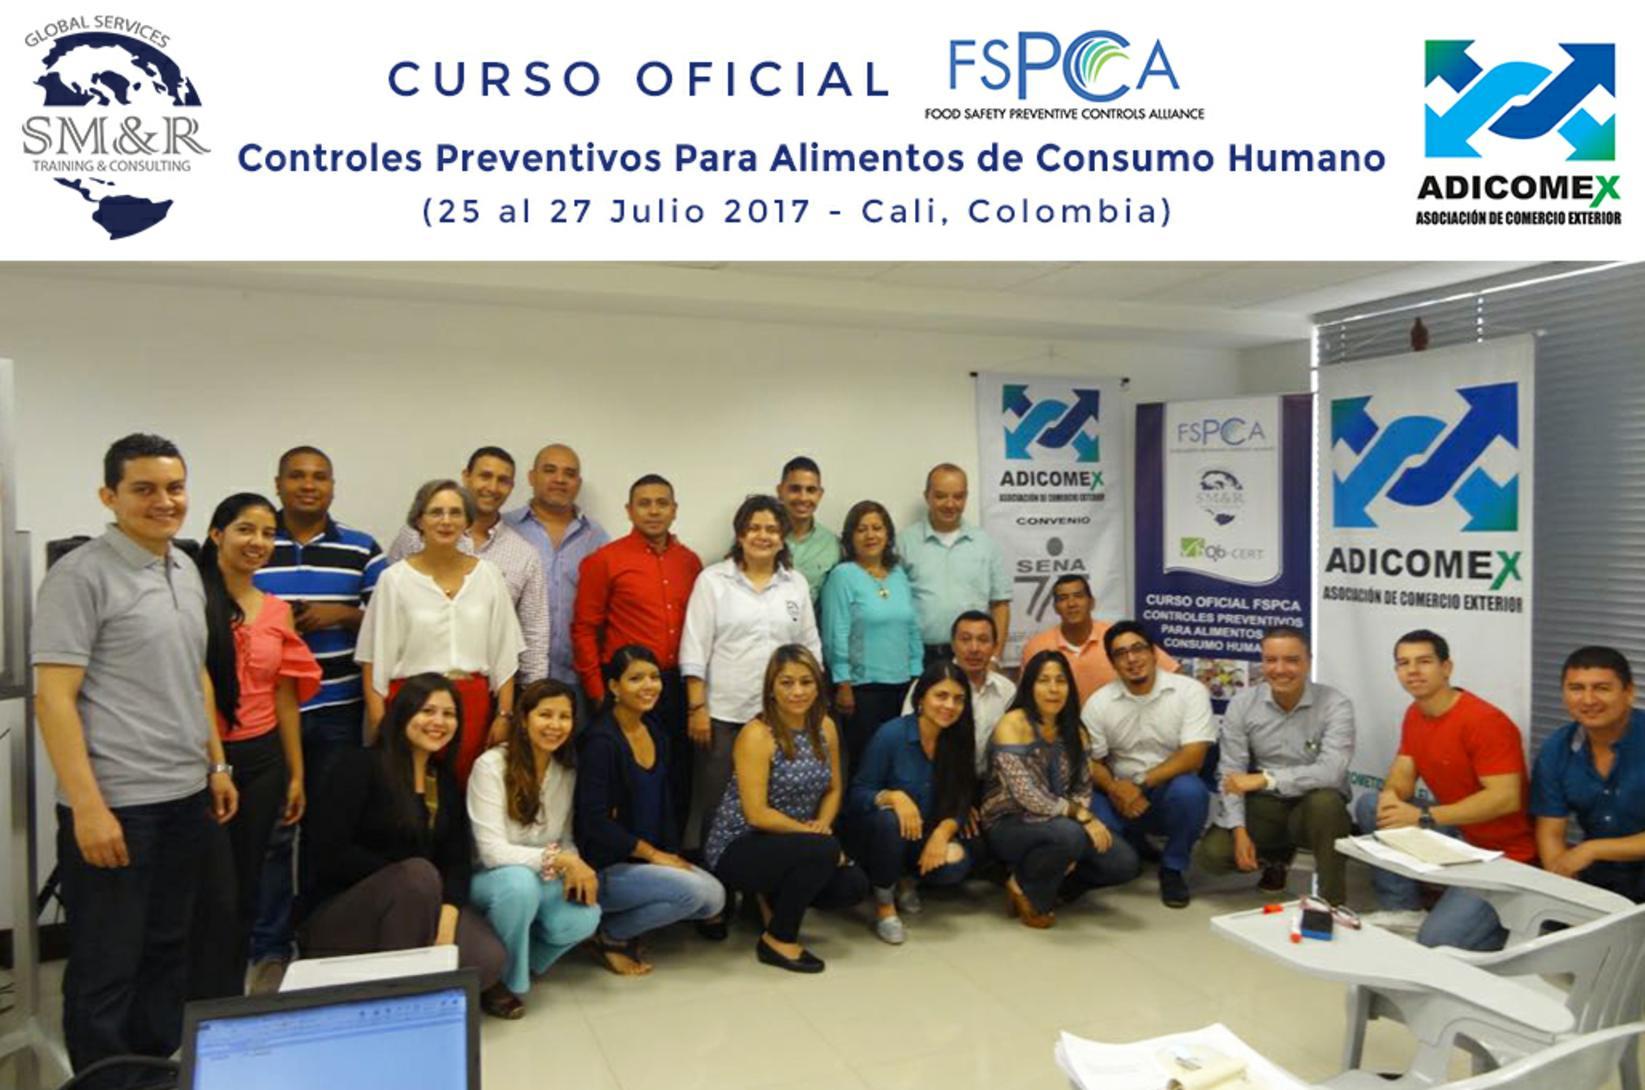 Grupo L FSPCA Cali Julio 2017